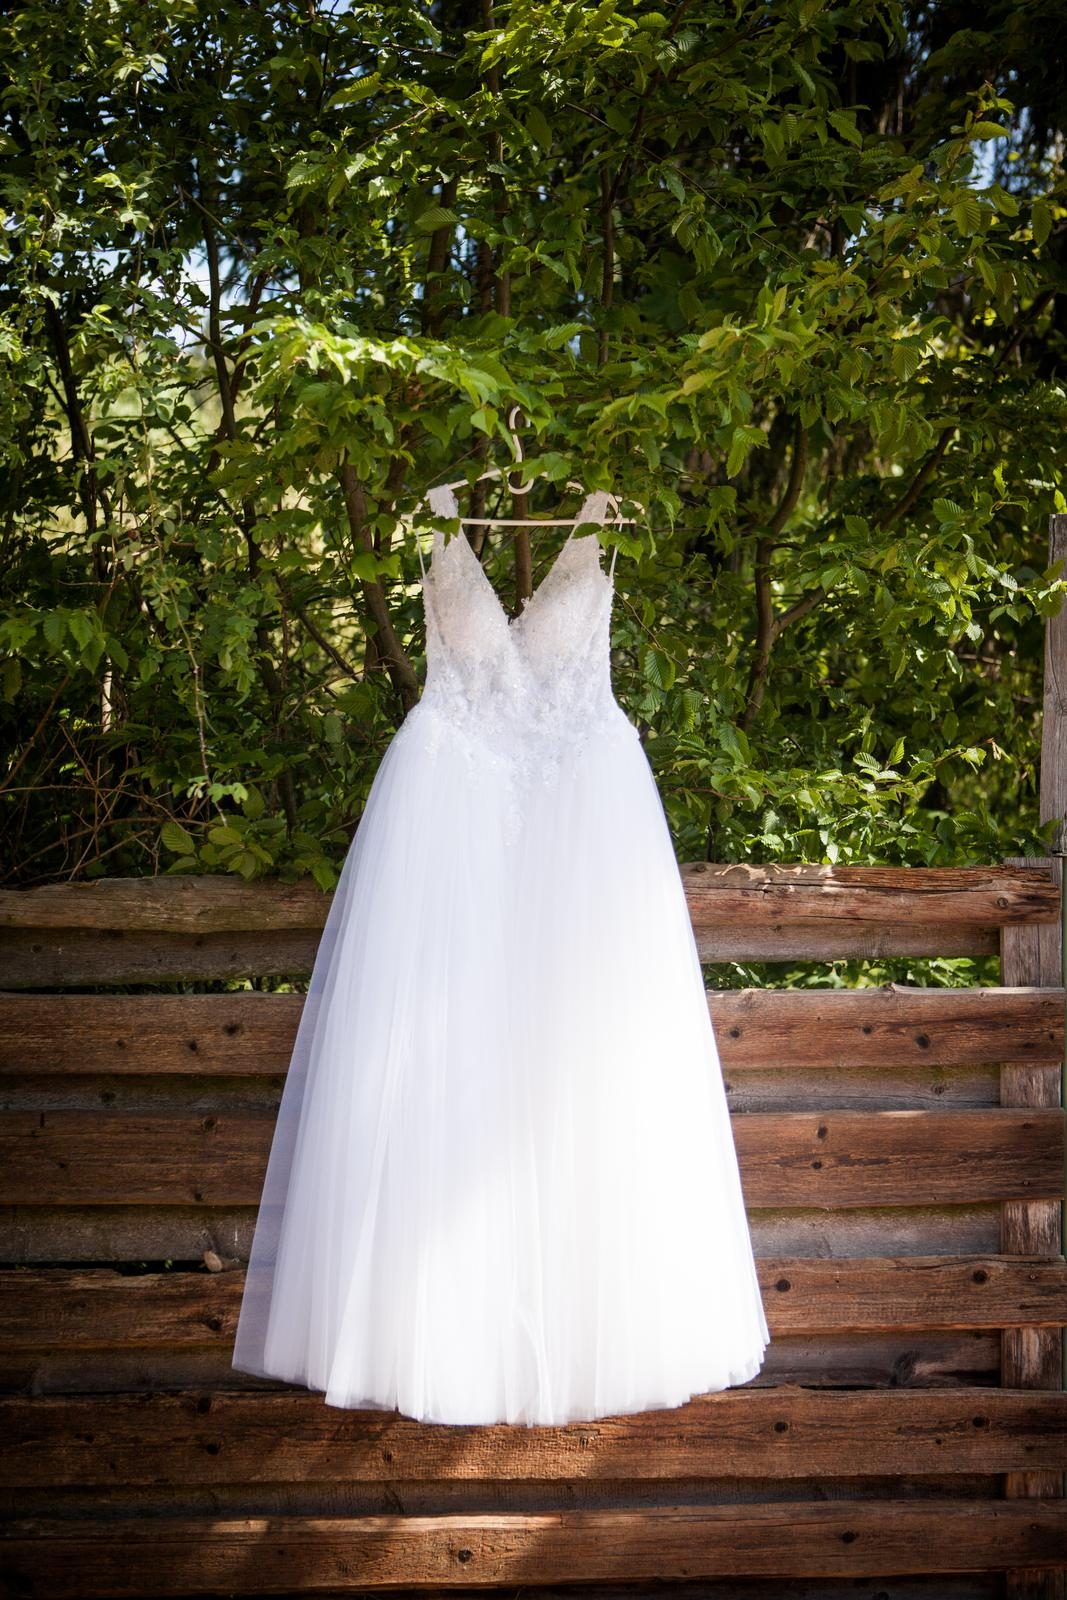 Svatební šaty Igar Euphoria - Obrázek č. 3